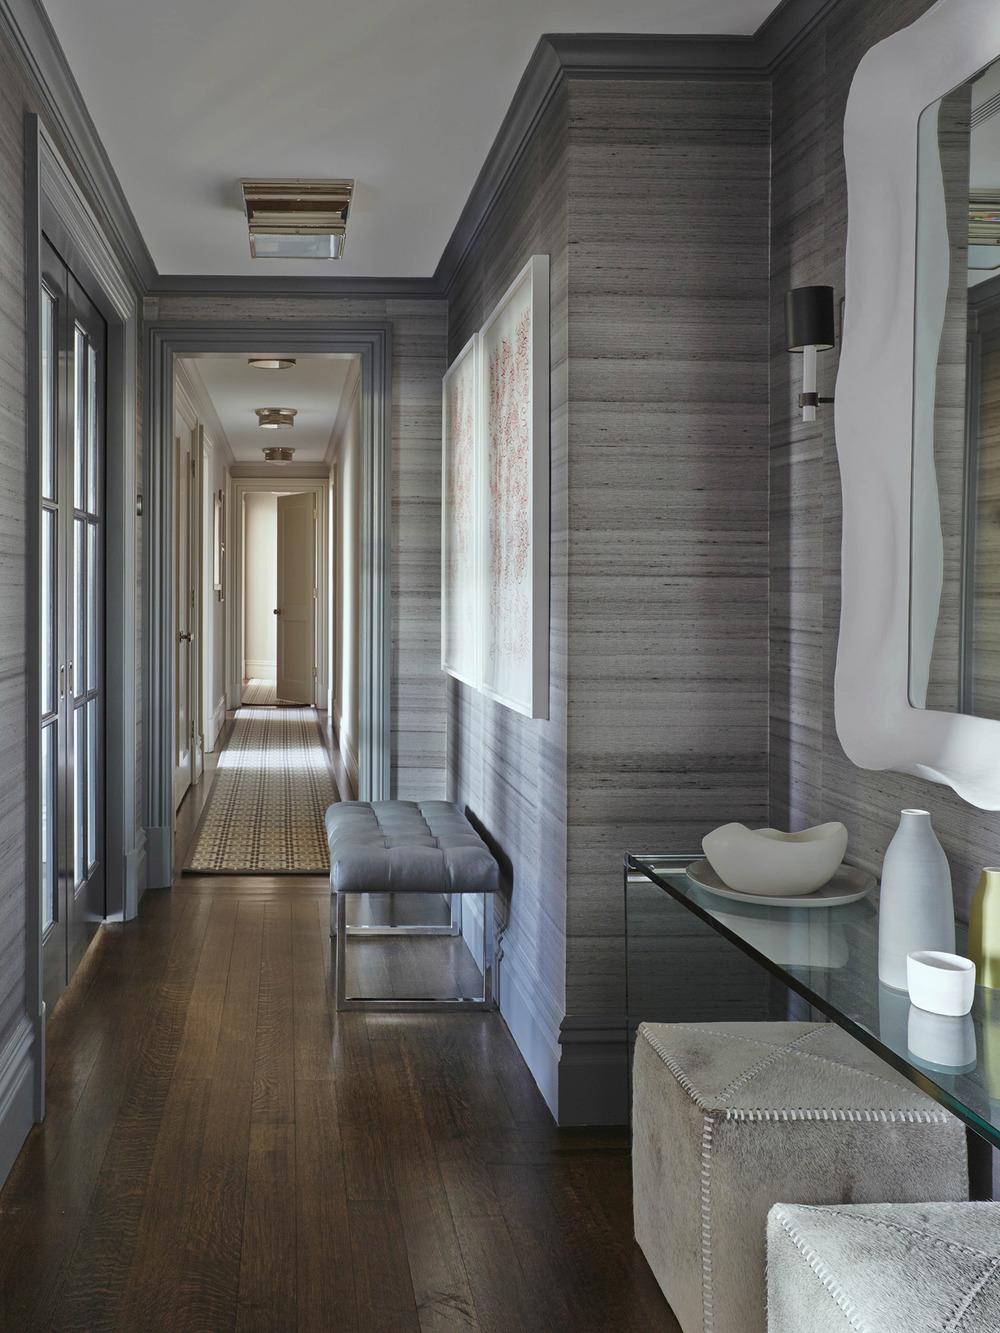 Alexander_Doherty_Design_Riverside_Park_4.jpg